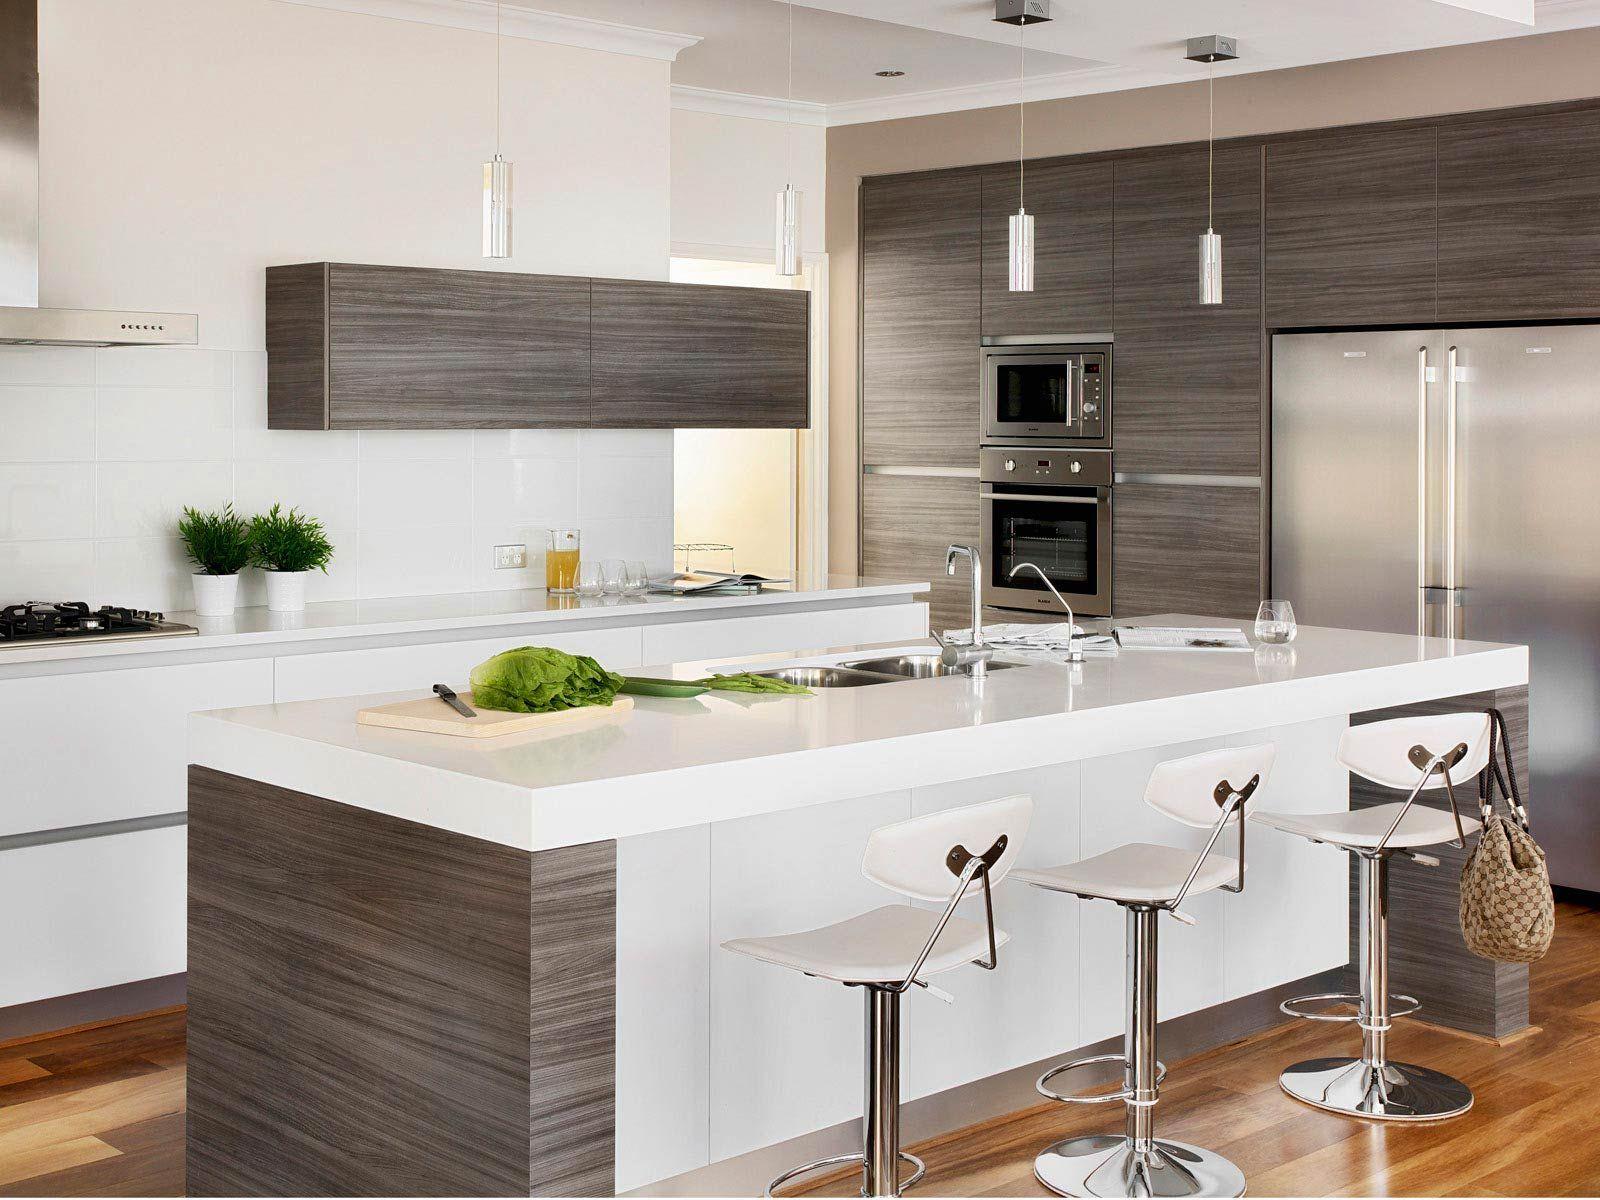 Modern Kitchen Renovation Home Design  The Bayfield  Contemporary  Kitchen  Perth  Webb